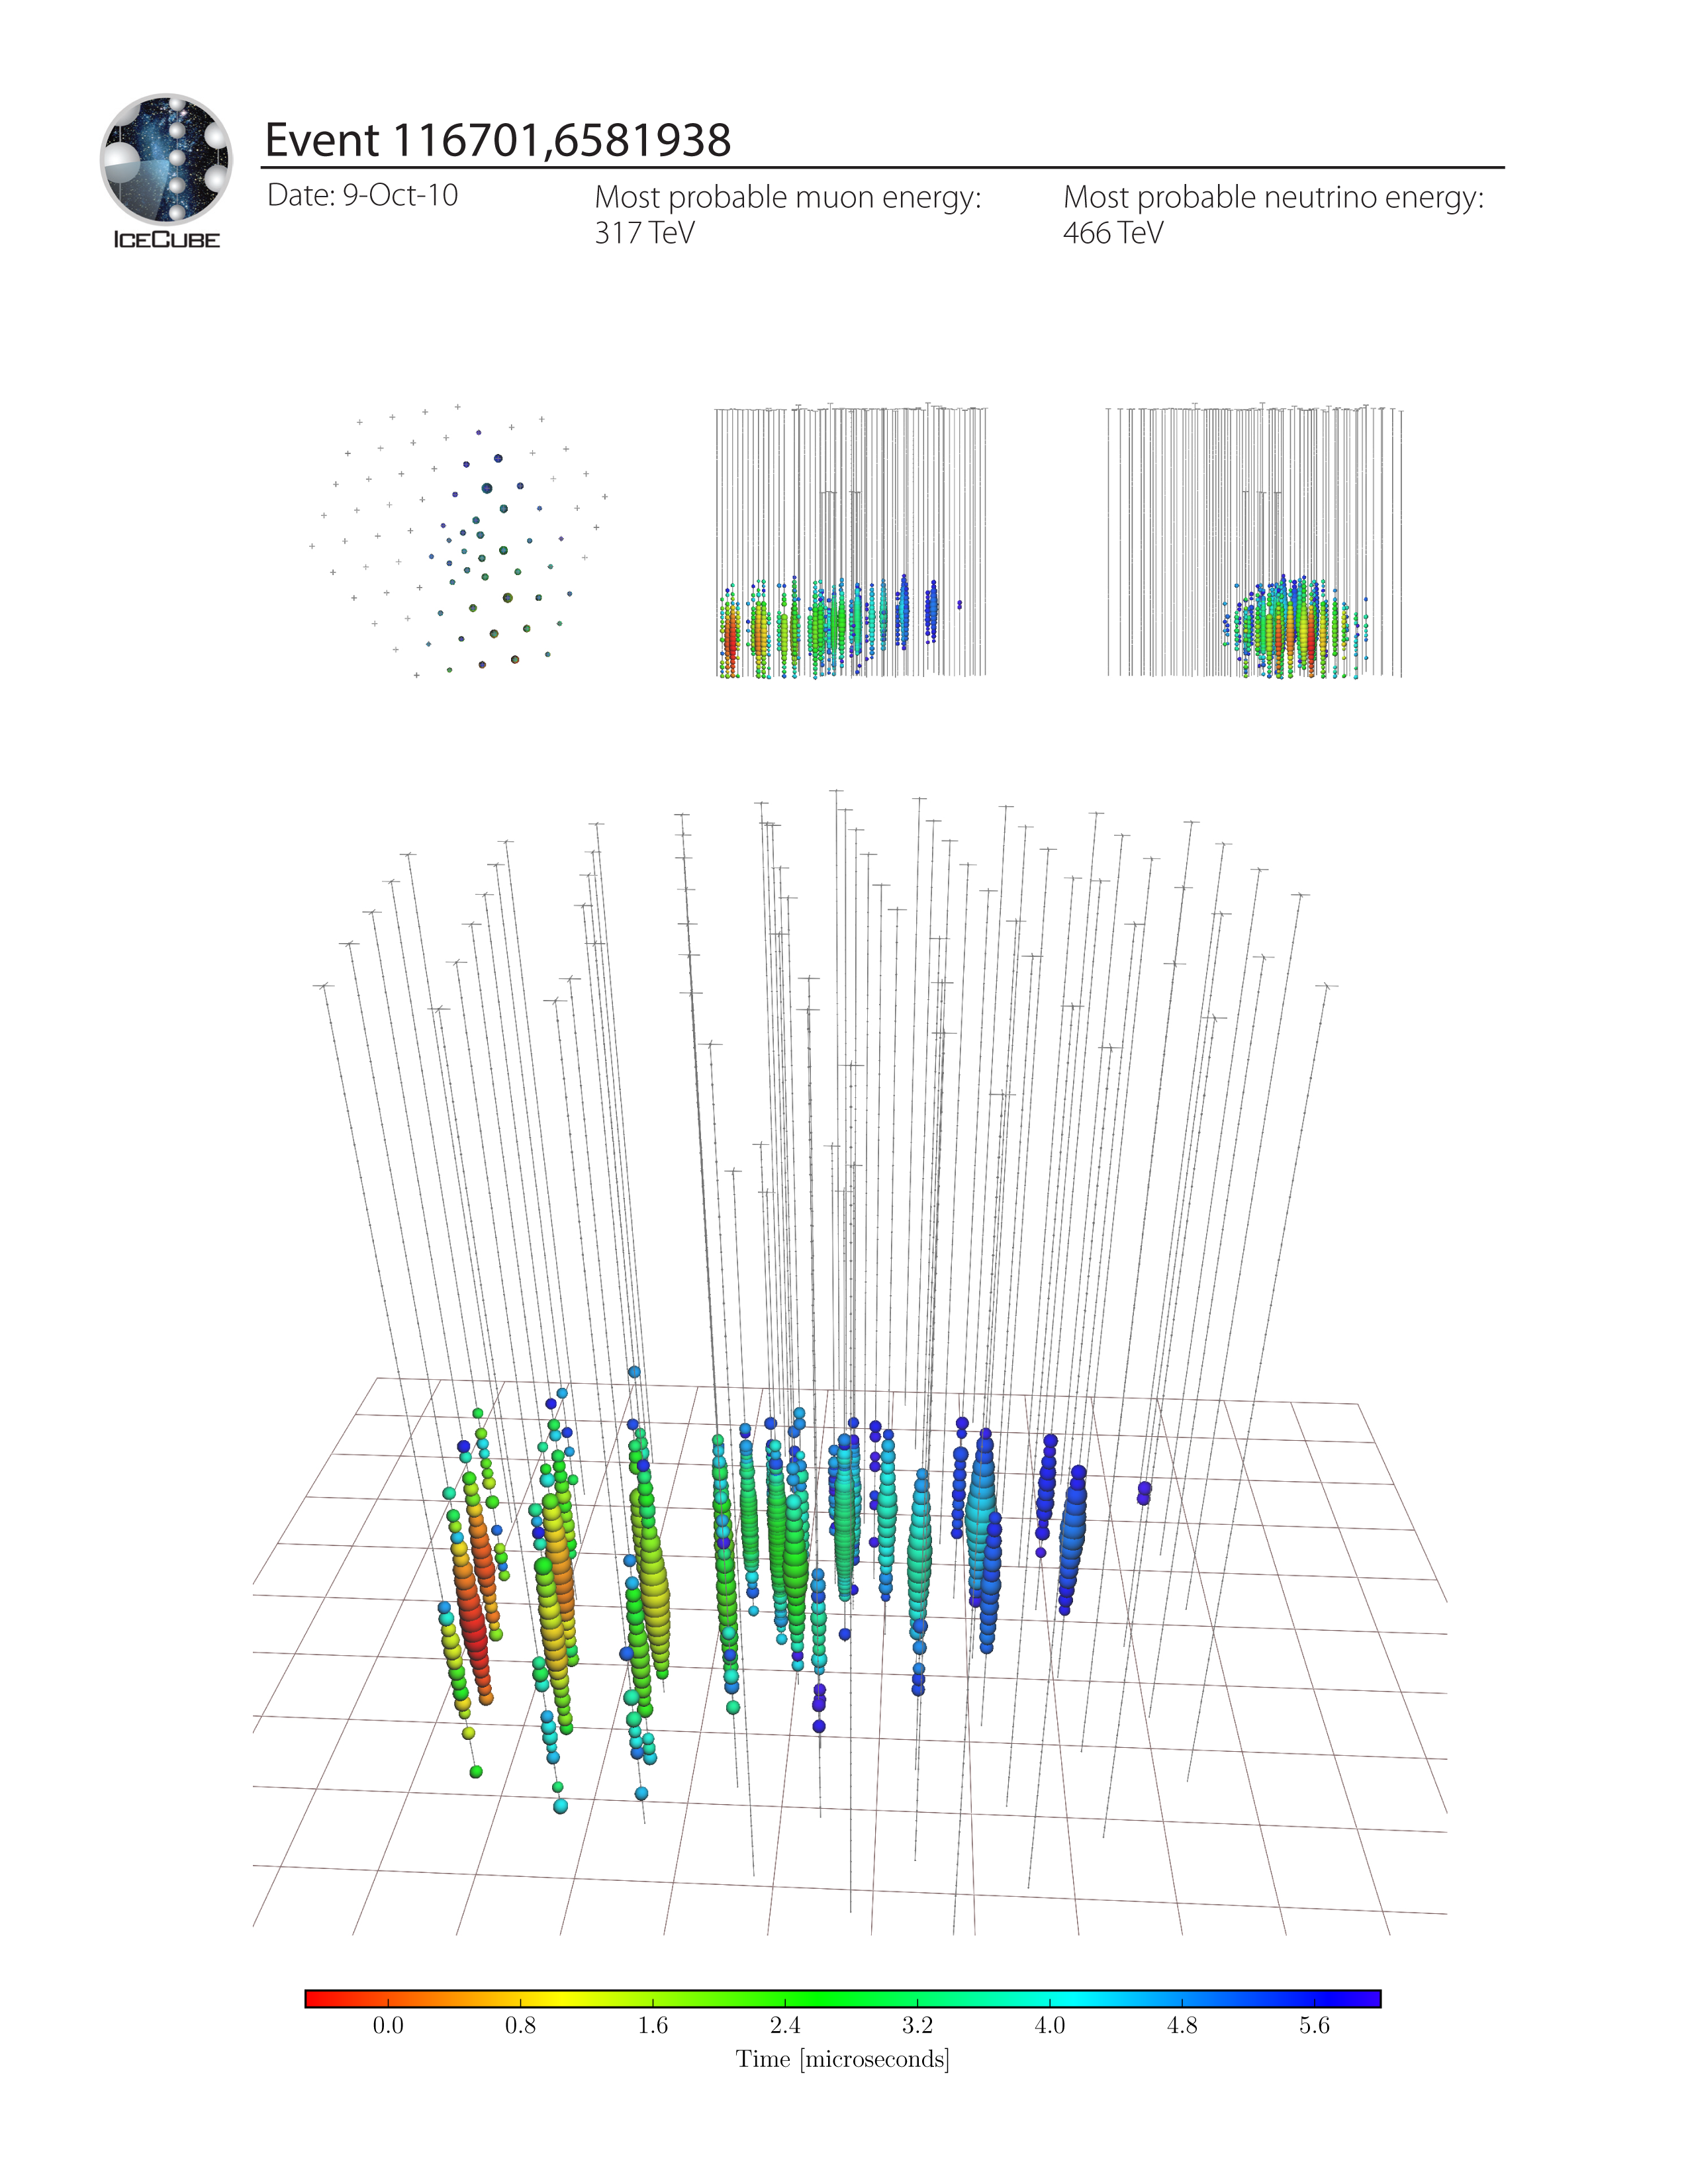 IceCube Event ID 116701,6581938. Most probable neutrino energy: 466 TeV, October 9, 2010